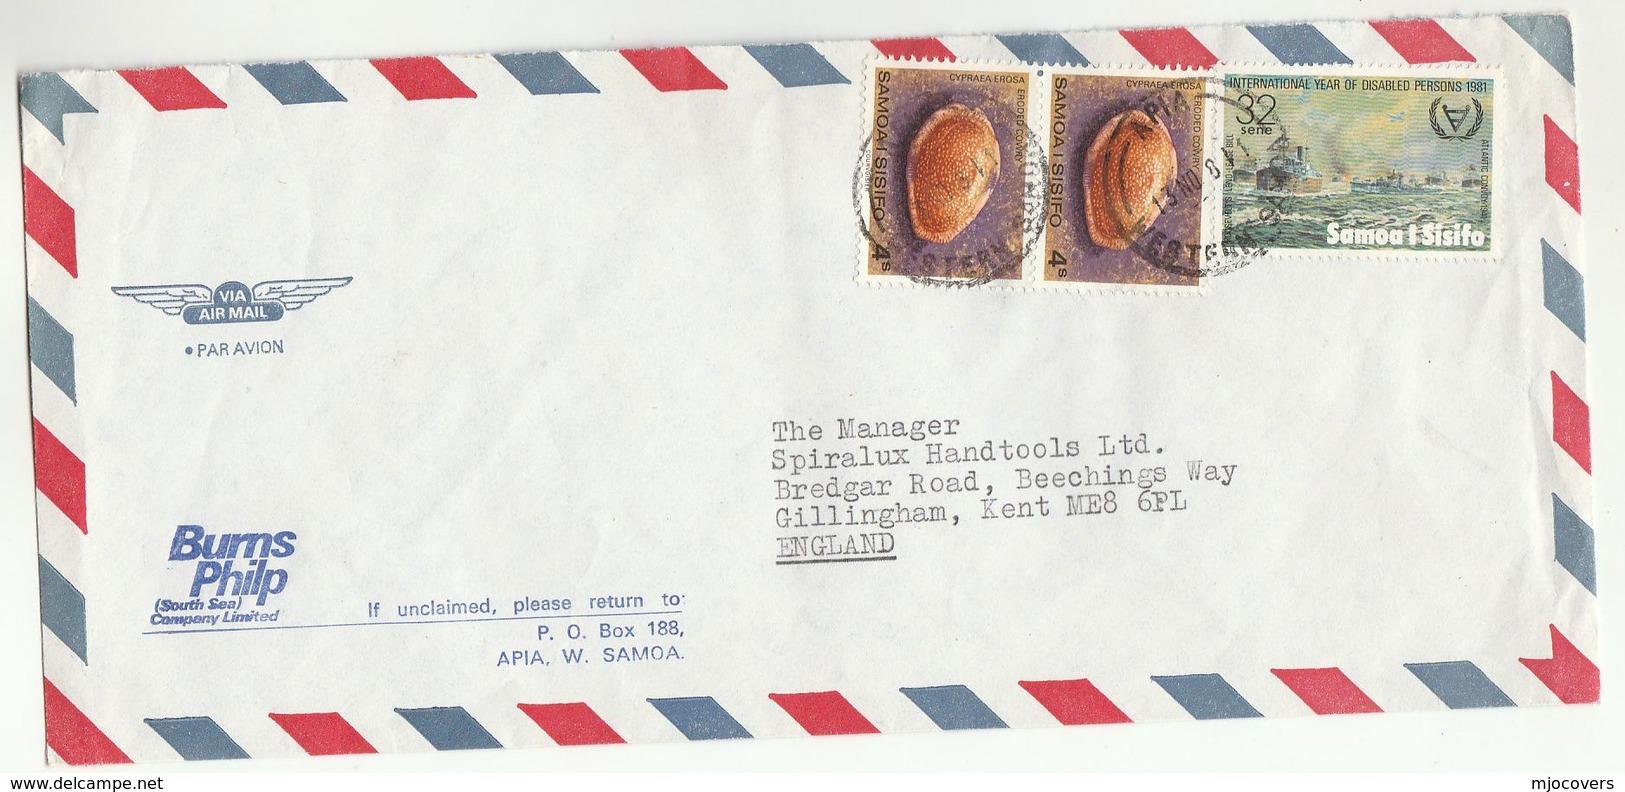 1981 SAMOA COVER Stamps 2x SHELL 1 X WWII CONVOY SHIP Airmail BURN PHILIP LTD To GB - Samoa